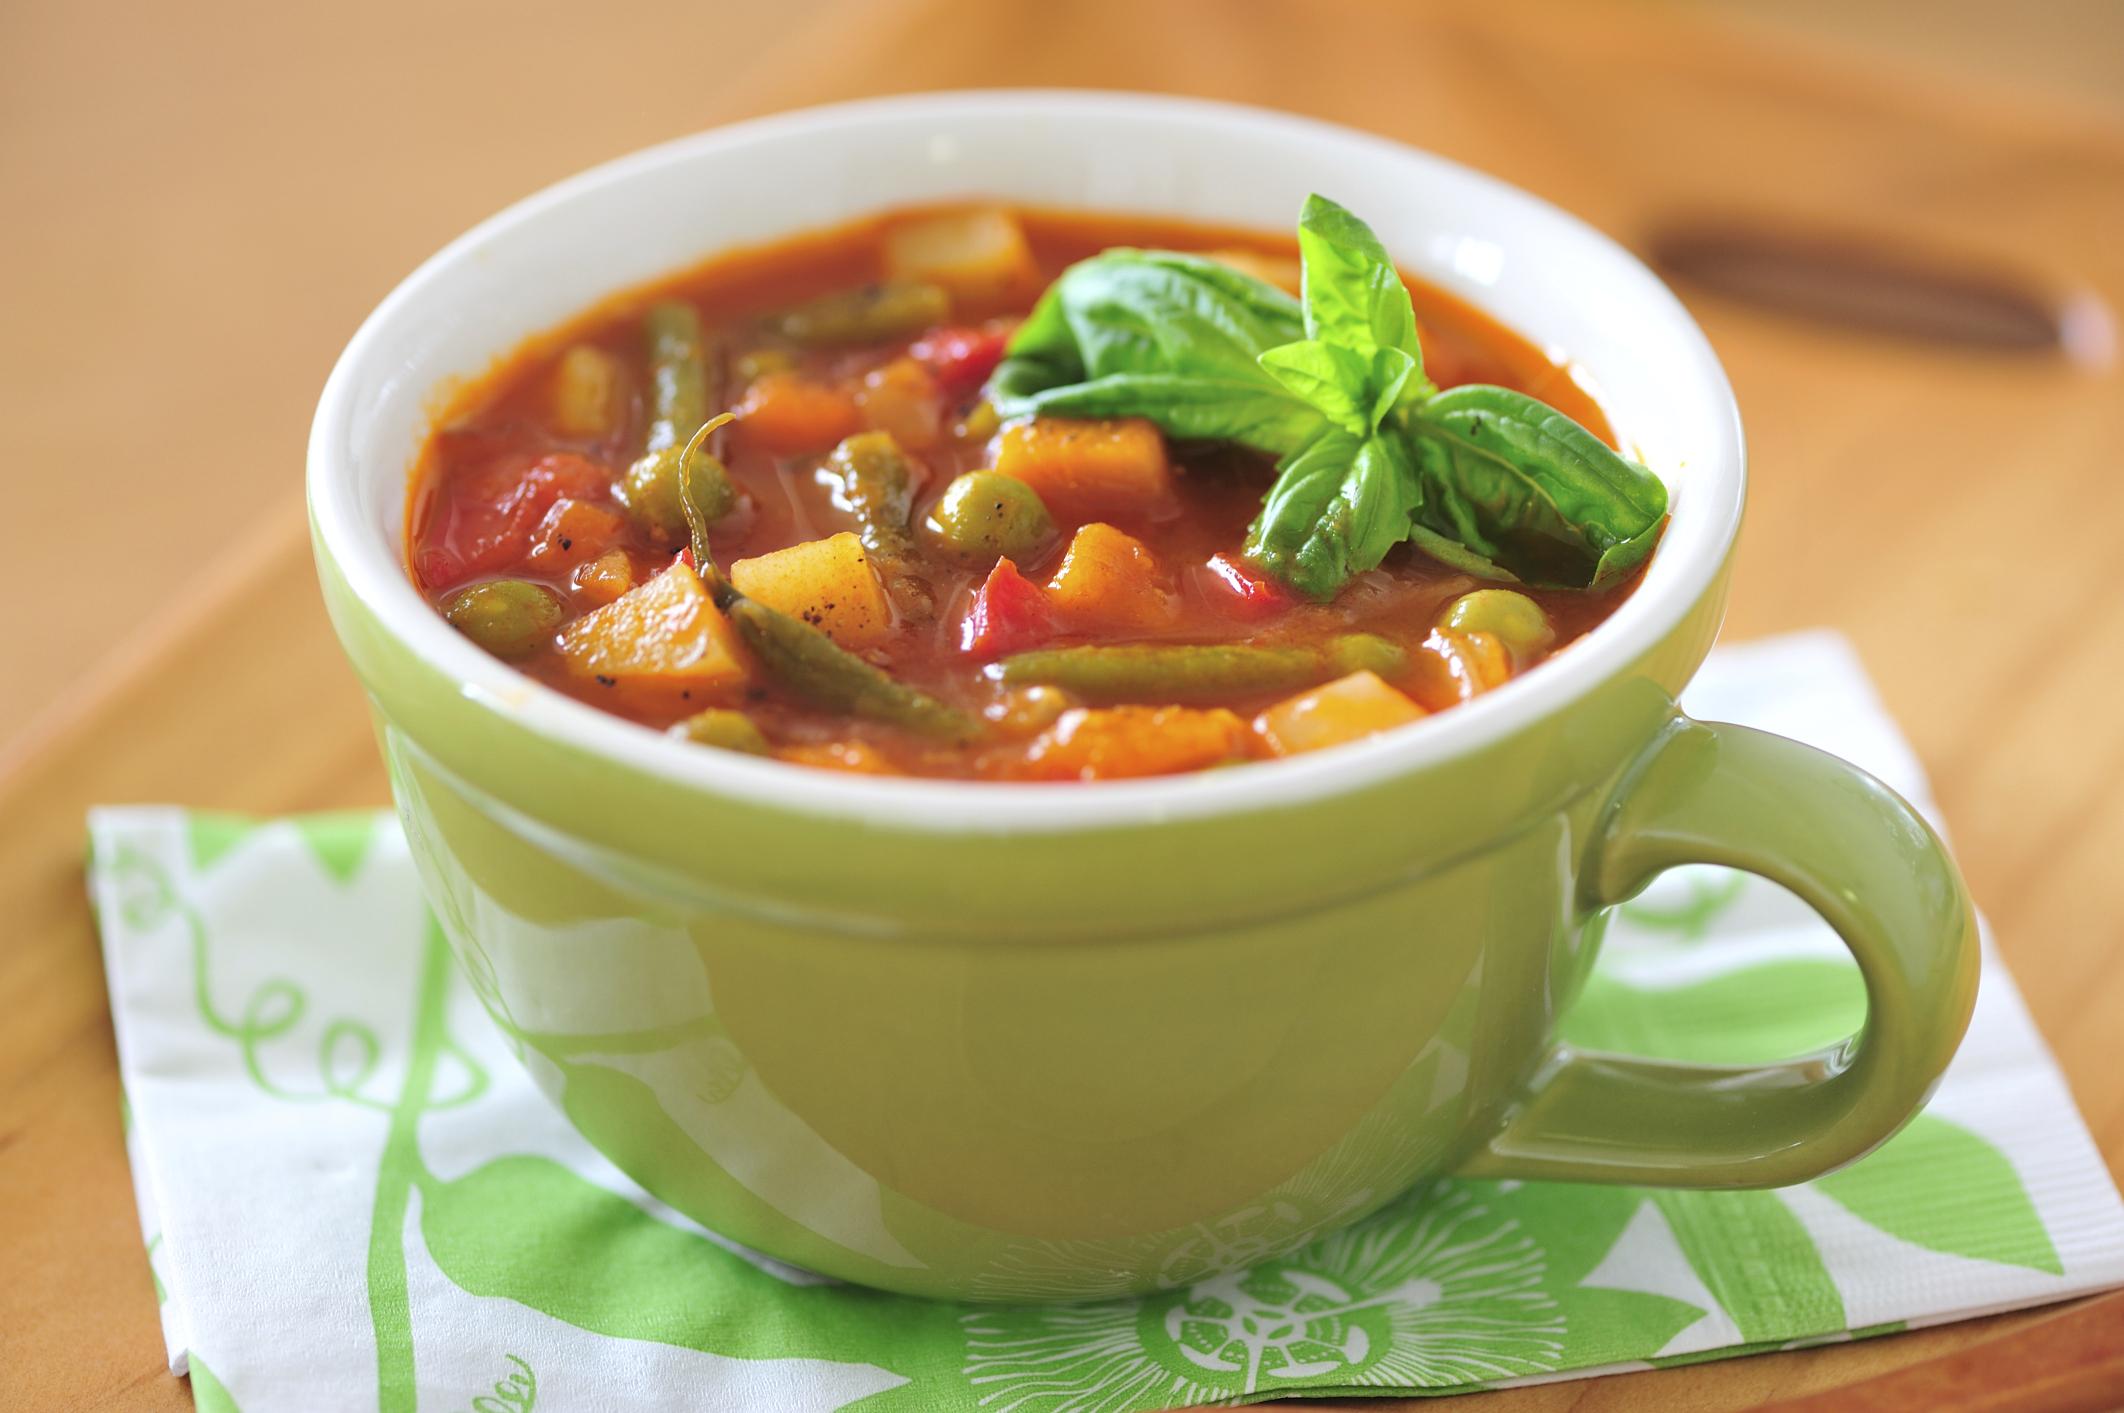 Sacred heart soup recipe how to make